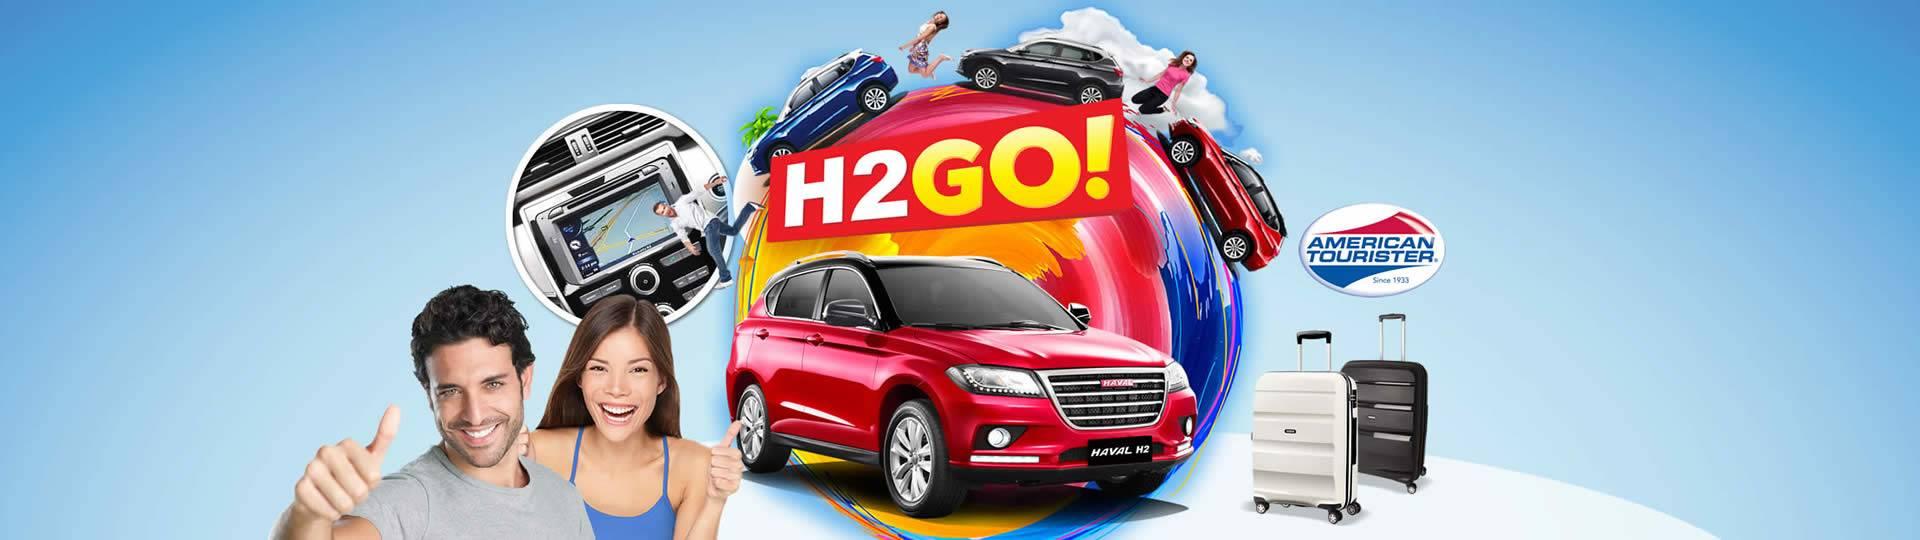 Haval H2GO